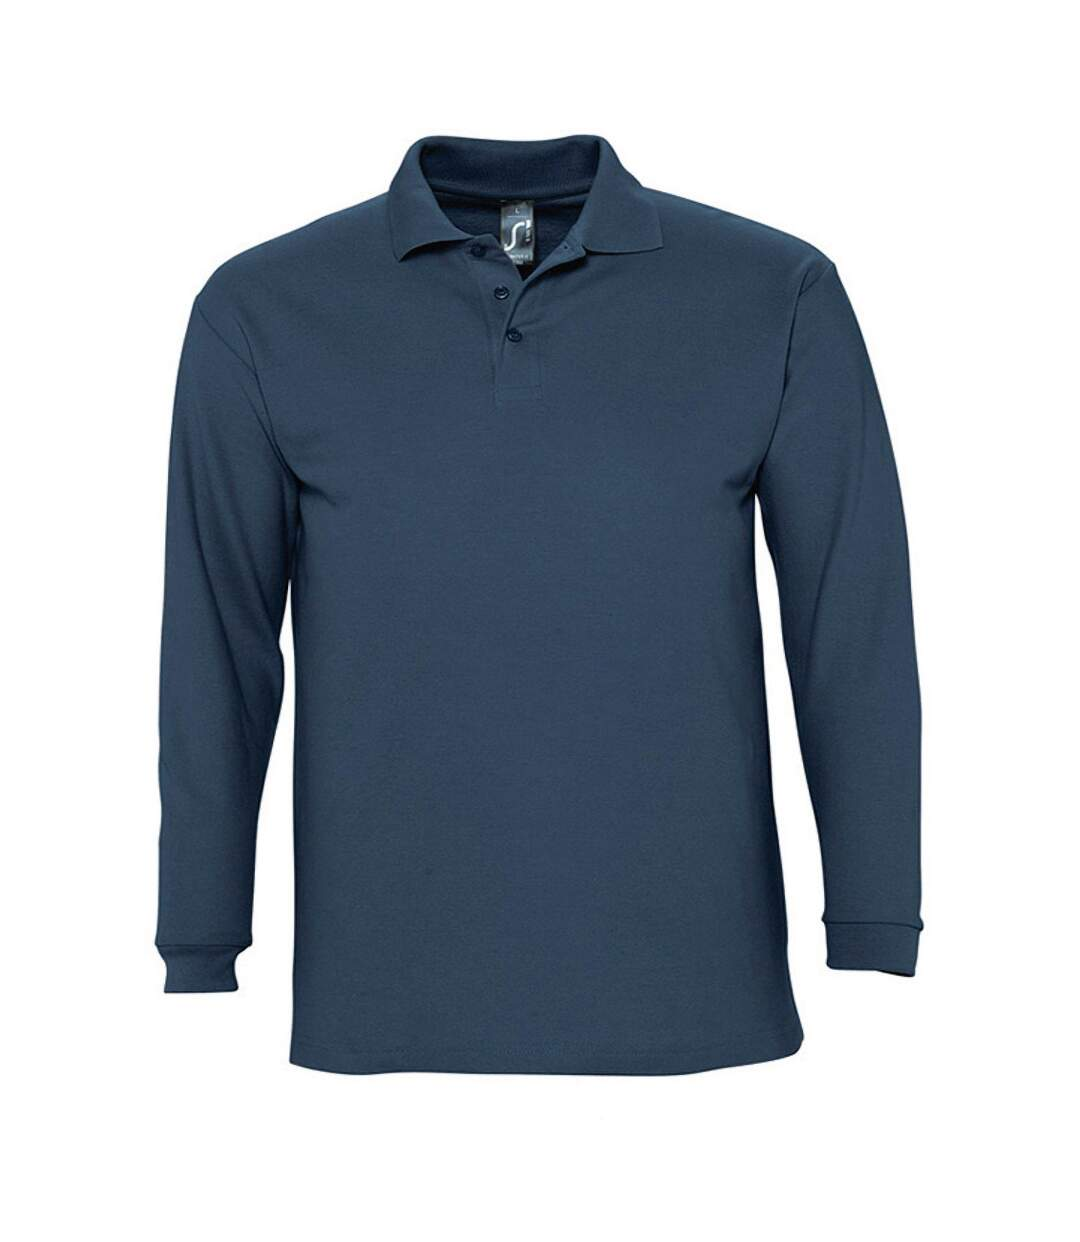 SOLS Mens Winter II Long Sleeve Pique Cotton Polo Shirt (Denim) - UTPC329